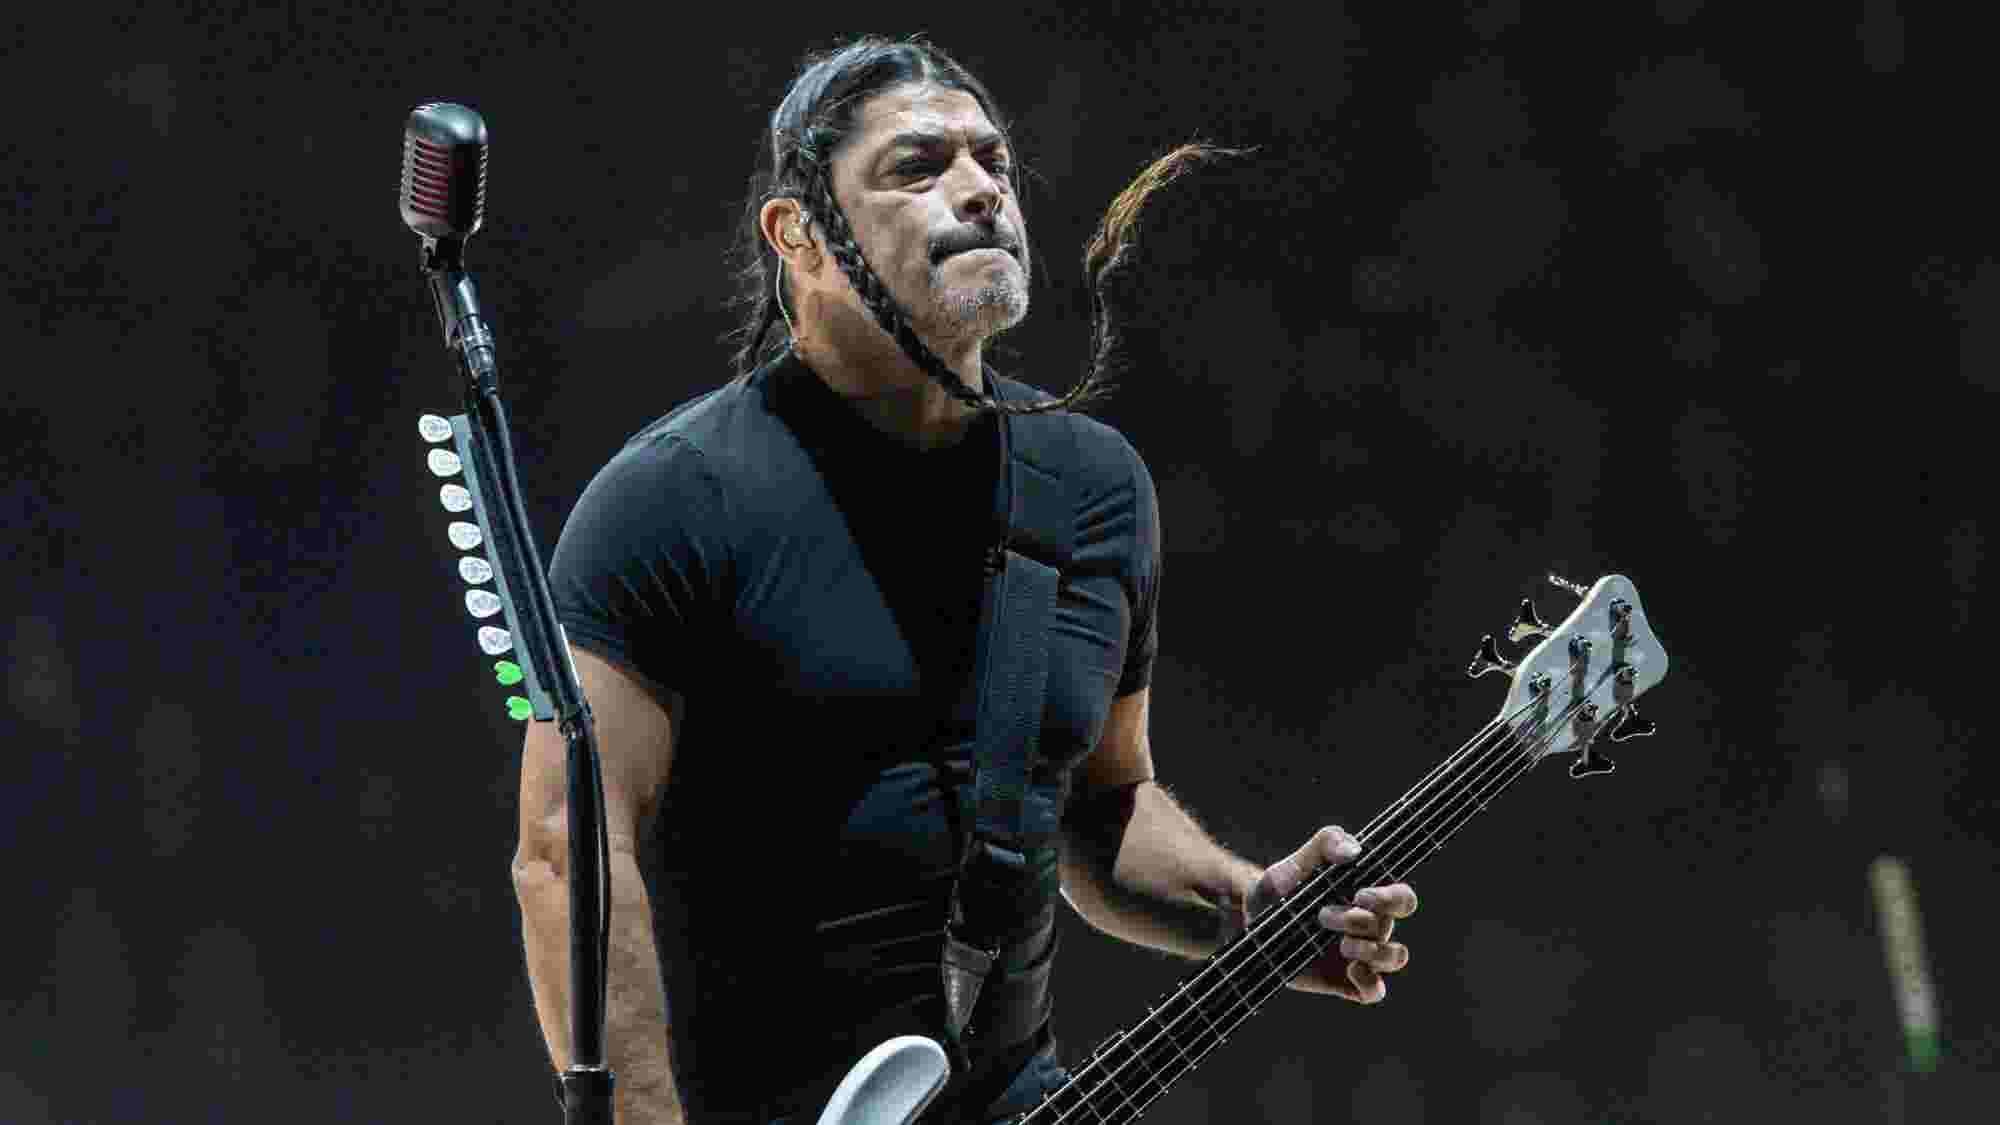 cd6f058c Metallica unfurled latest tricks and enduring epics in Indianapolis concert